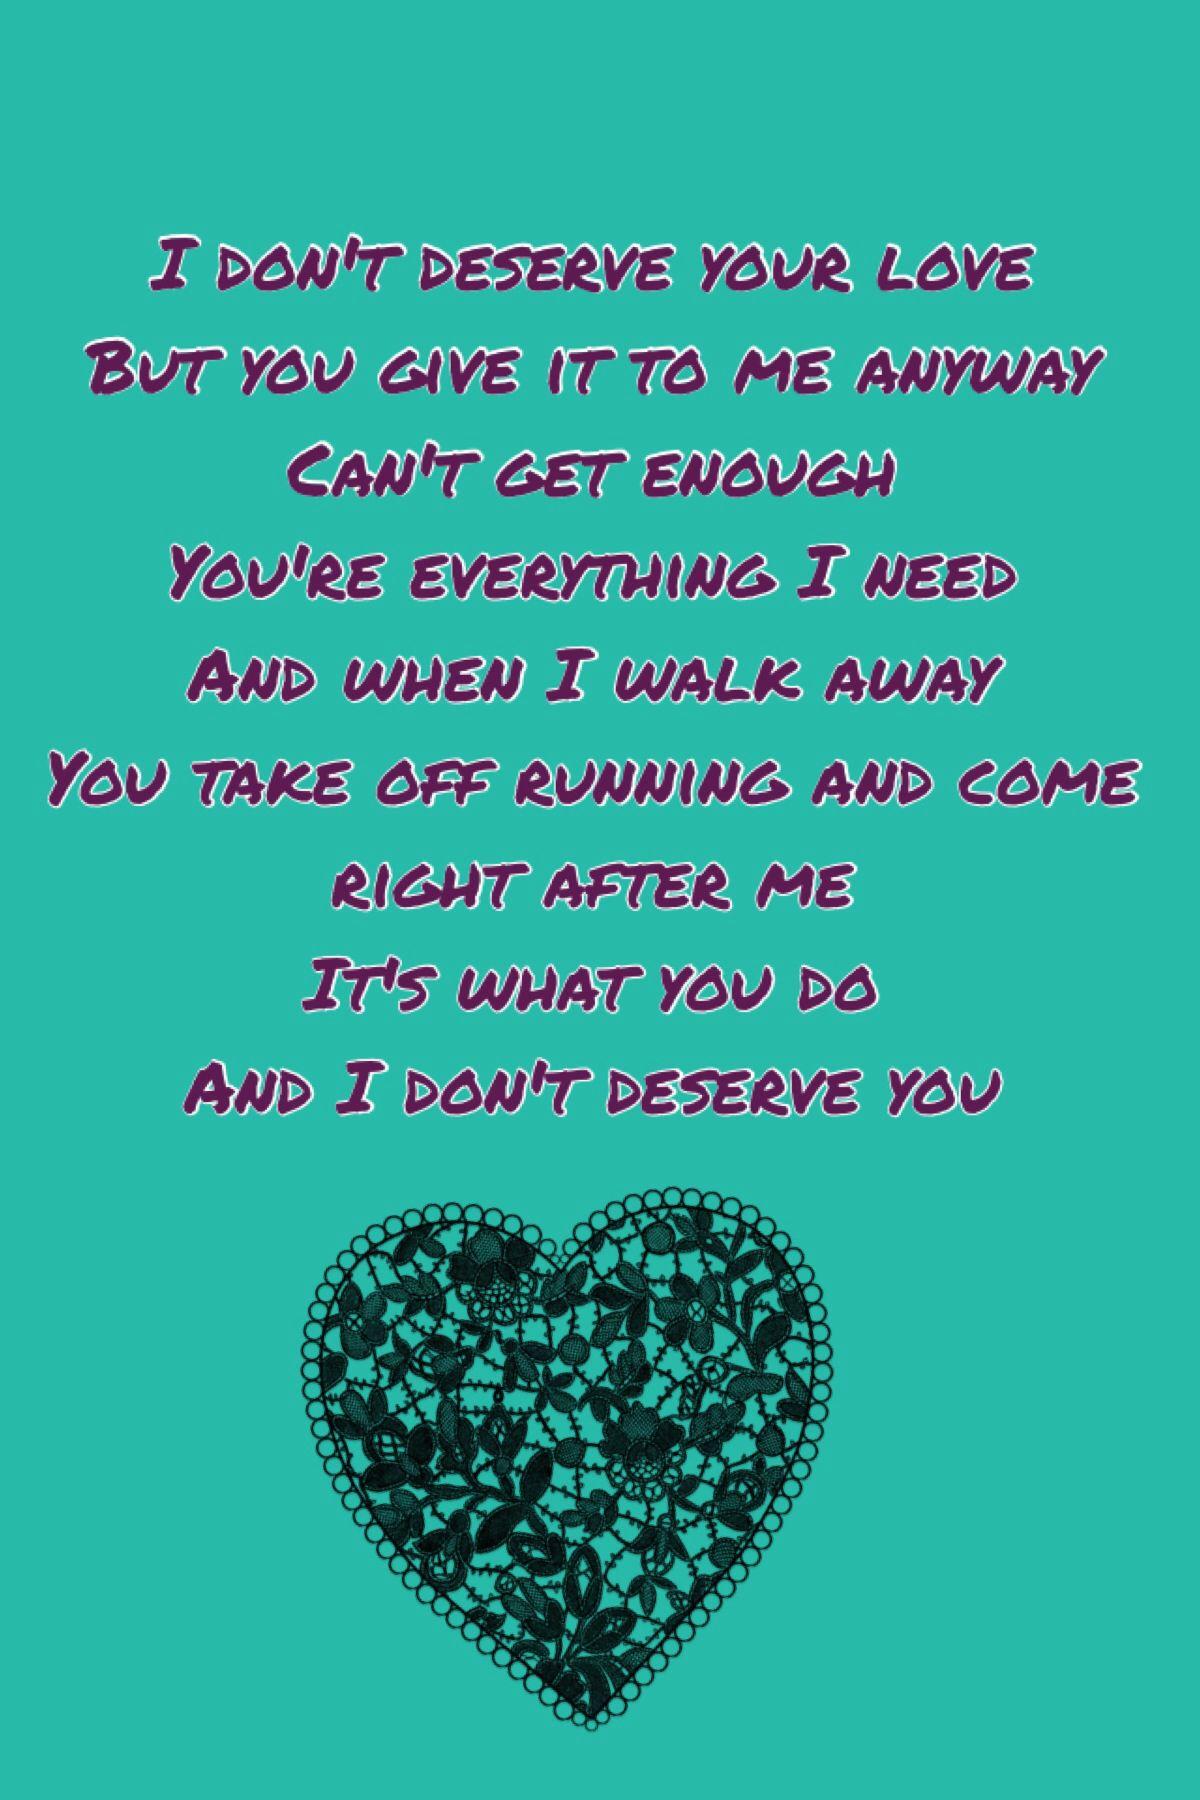 Paul Van Dyk Ft Plumb I Don T Deserve You Seven Lions Remix